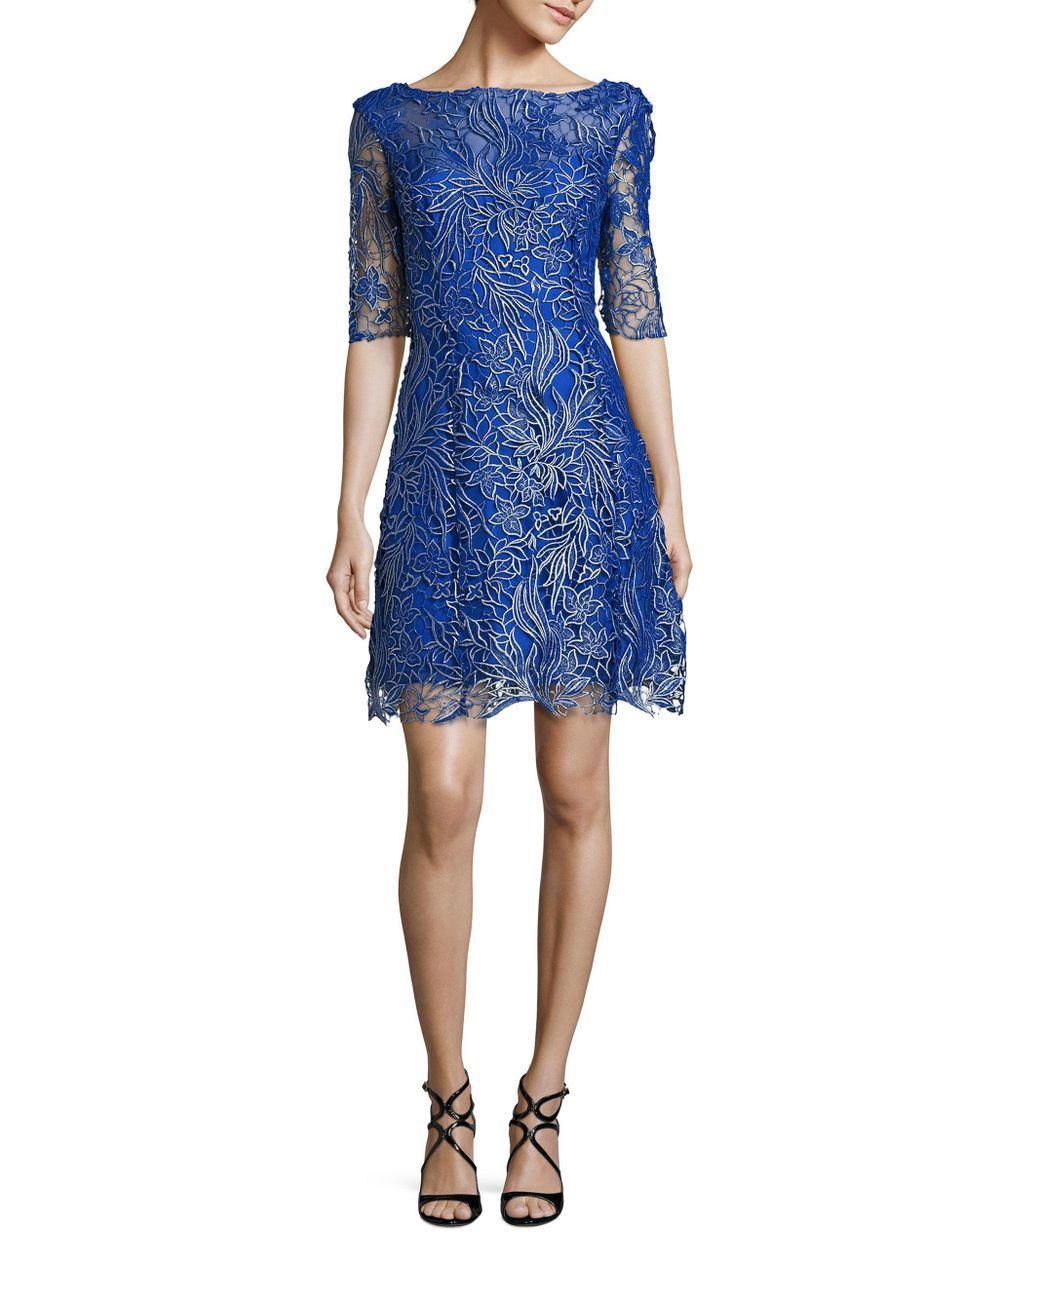 9c895a255cb8f Women's Blue New York Metallic Floral Lace Dress | 25. Apparel ...